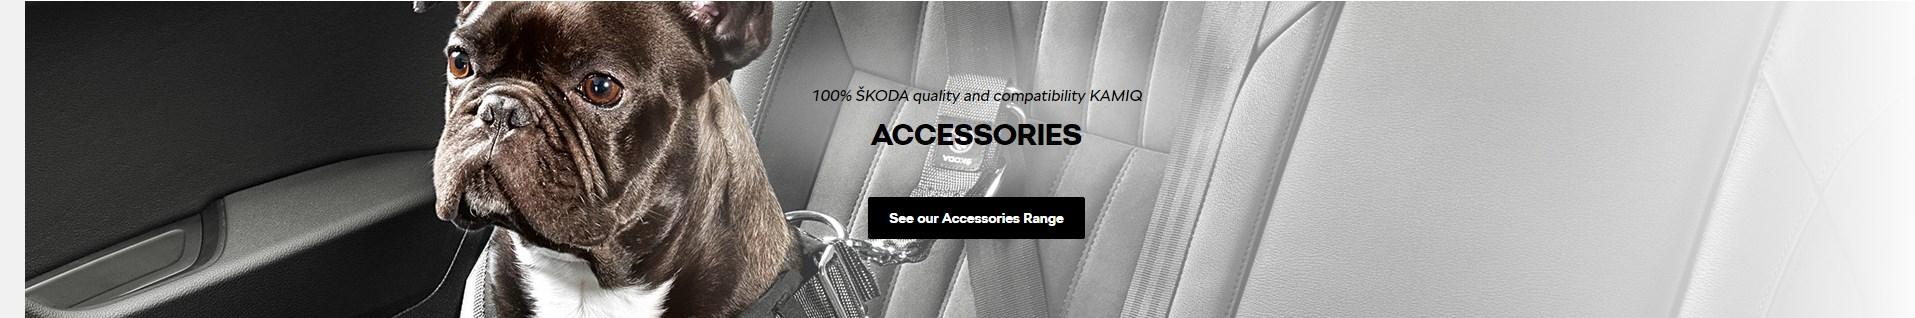 accessories-range